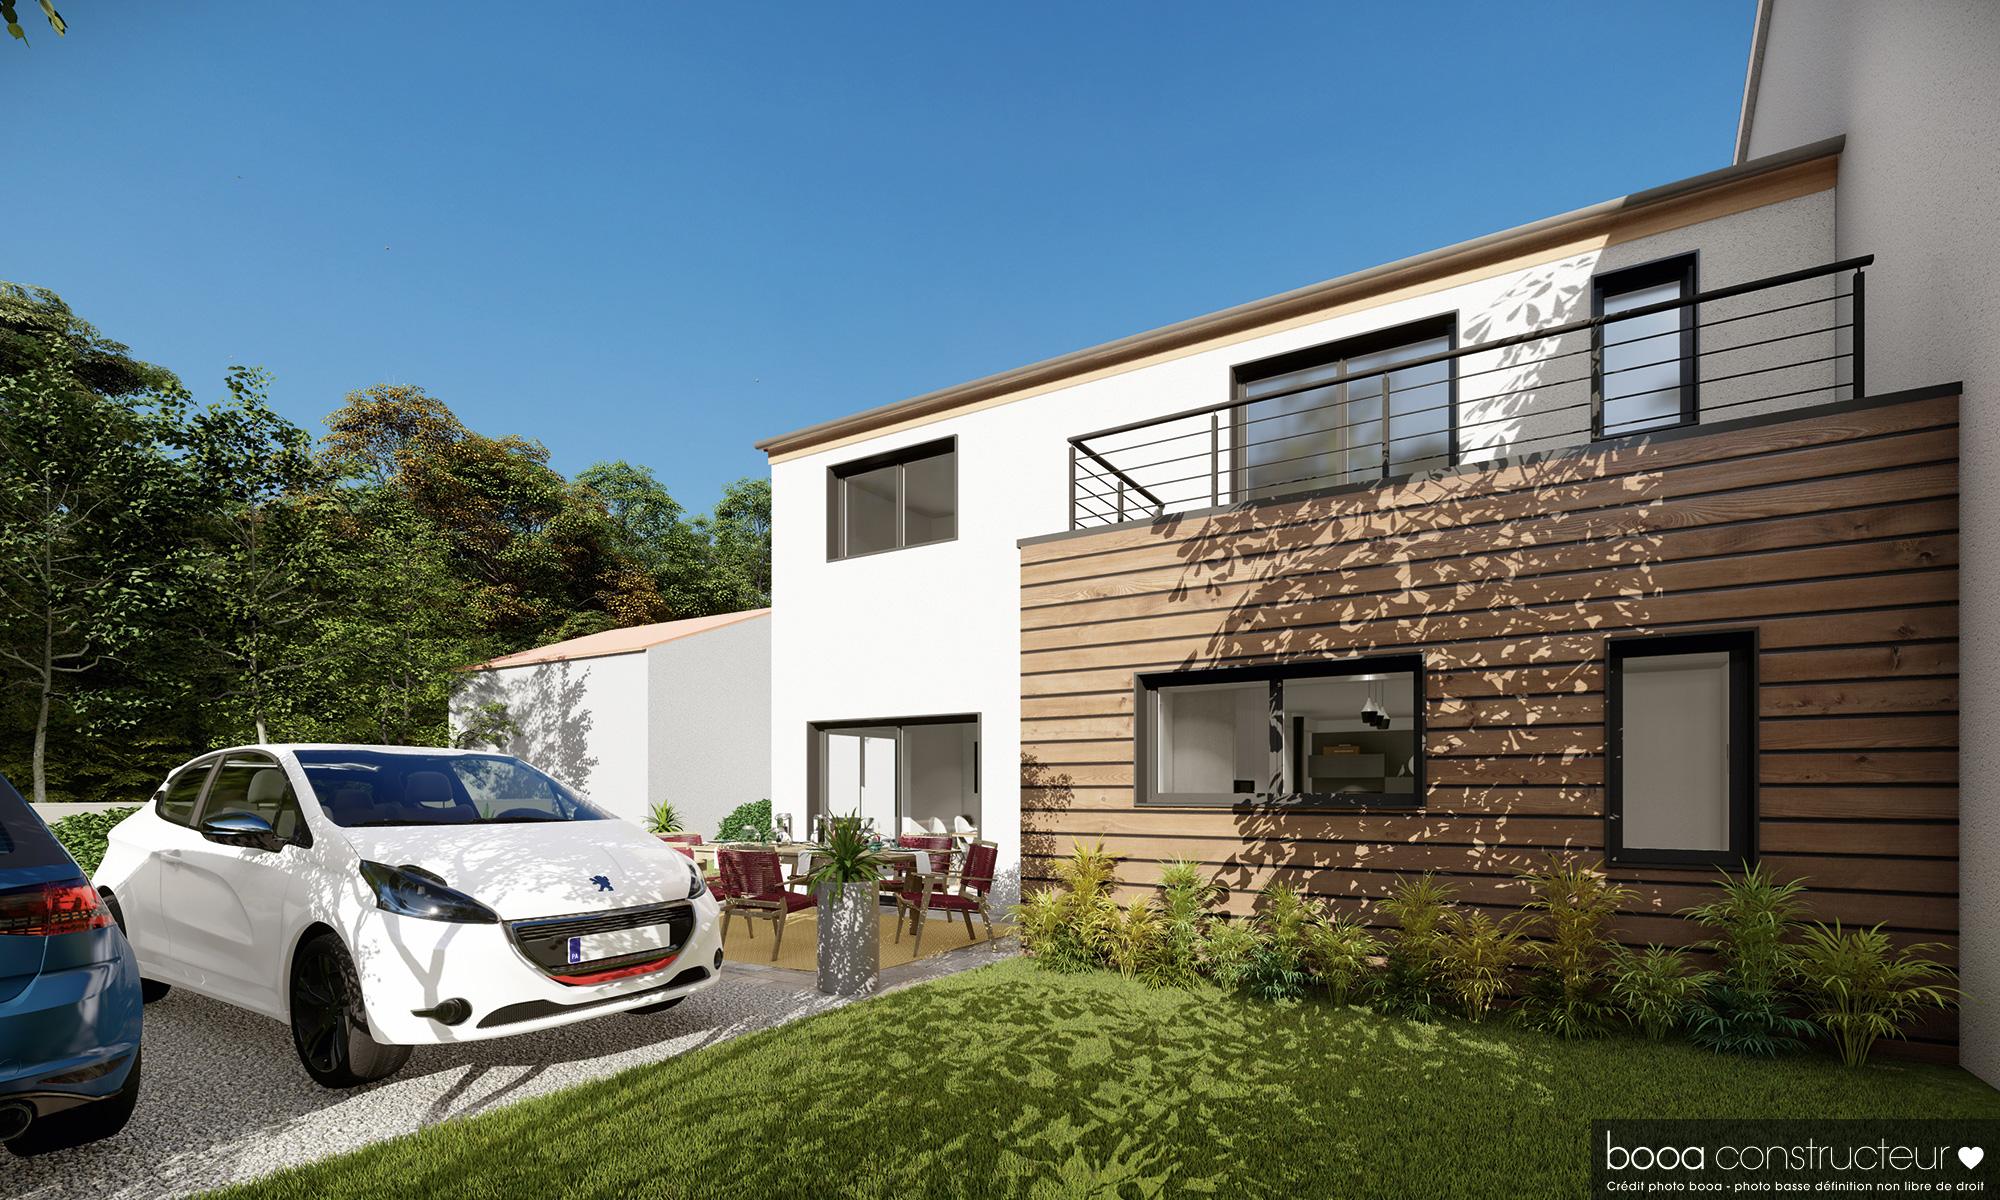 maison booa à toit pentu Rhône